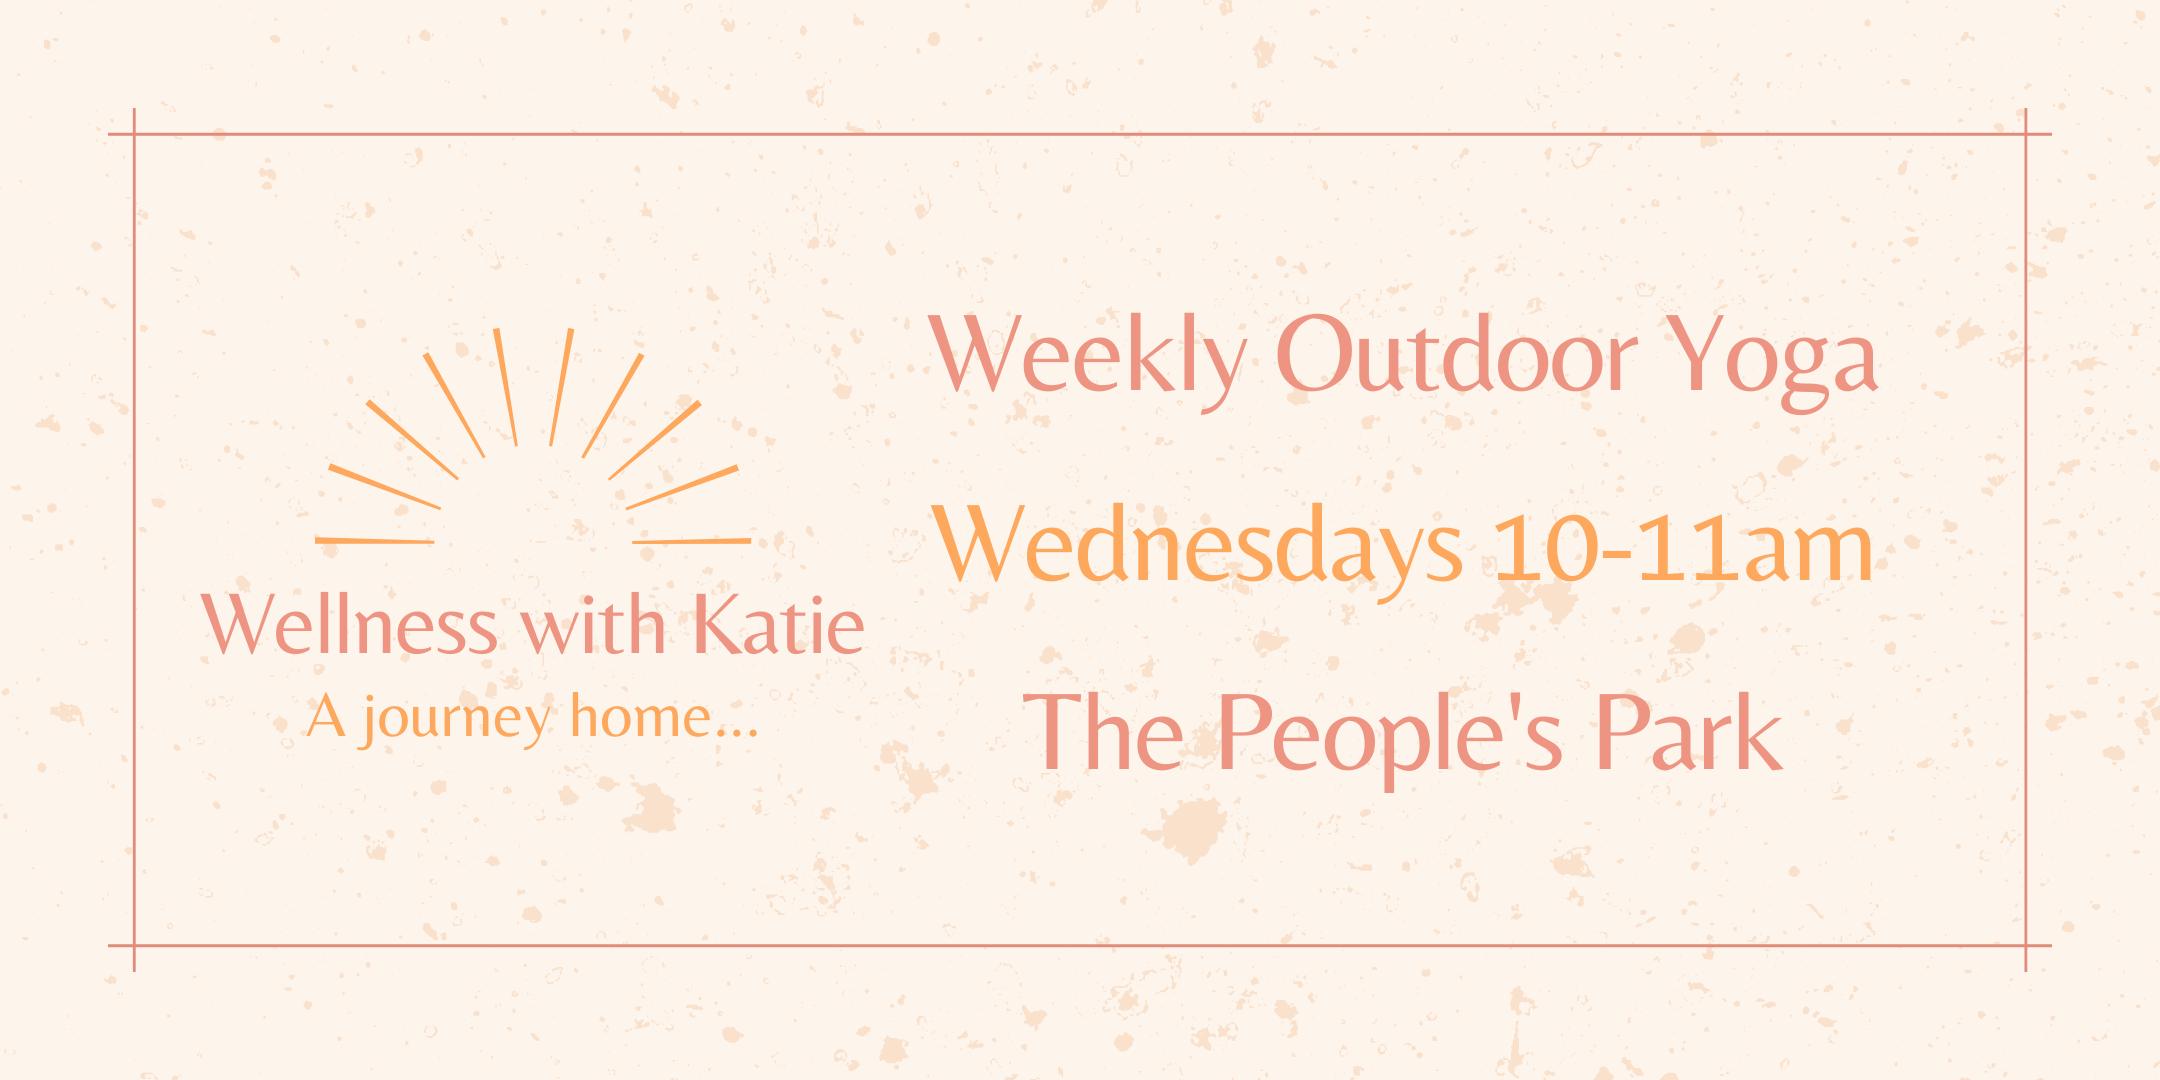 Weekly Outdoor Yoga in the People's Park with Katie Duggan